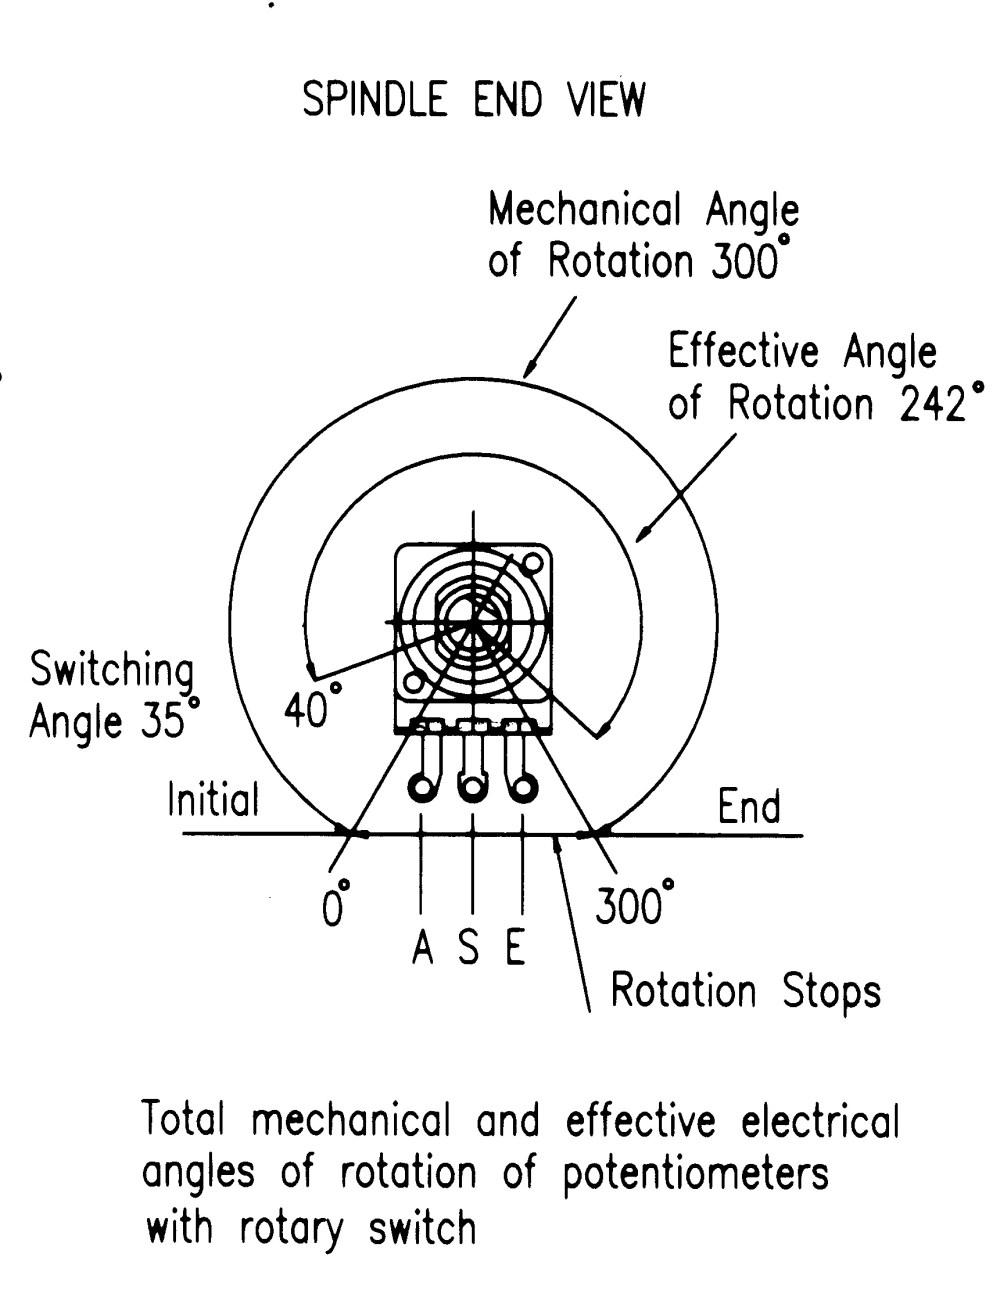 medium resolution of eco rotary switch potentiometer angles of rotation